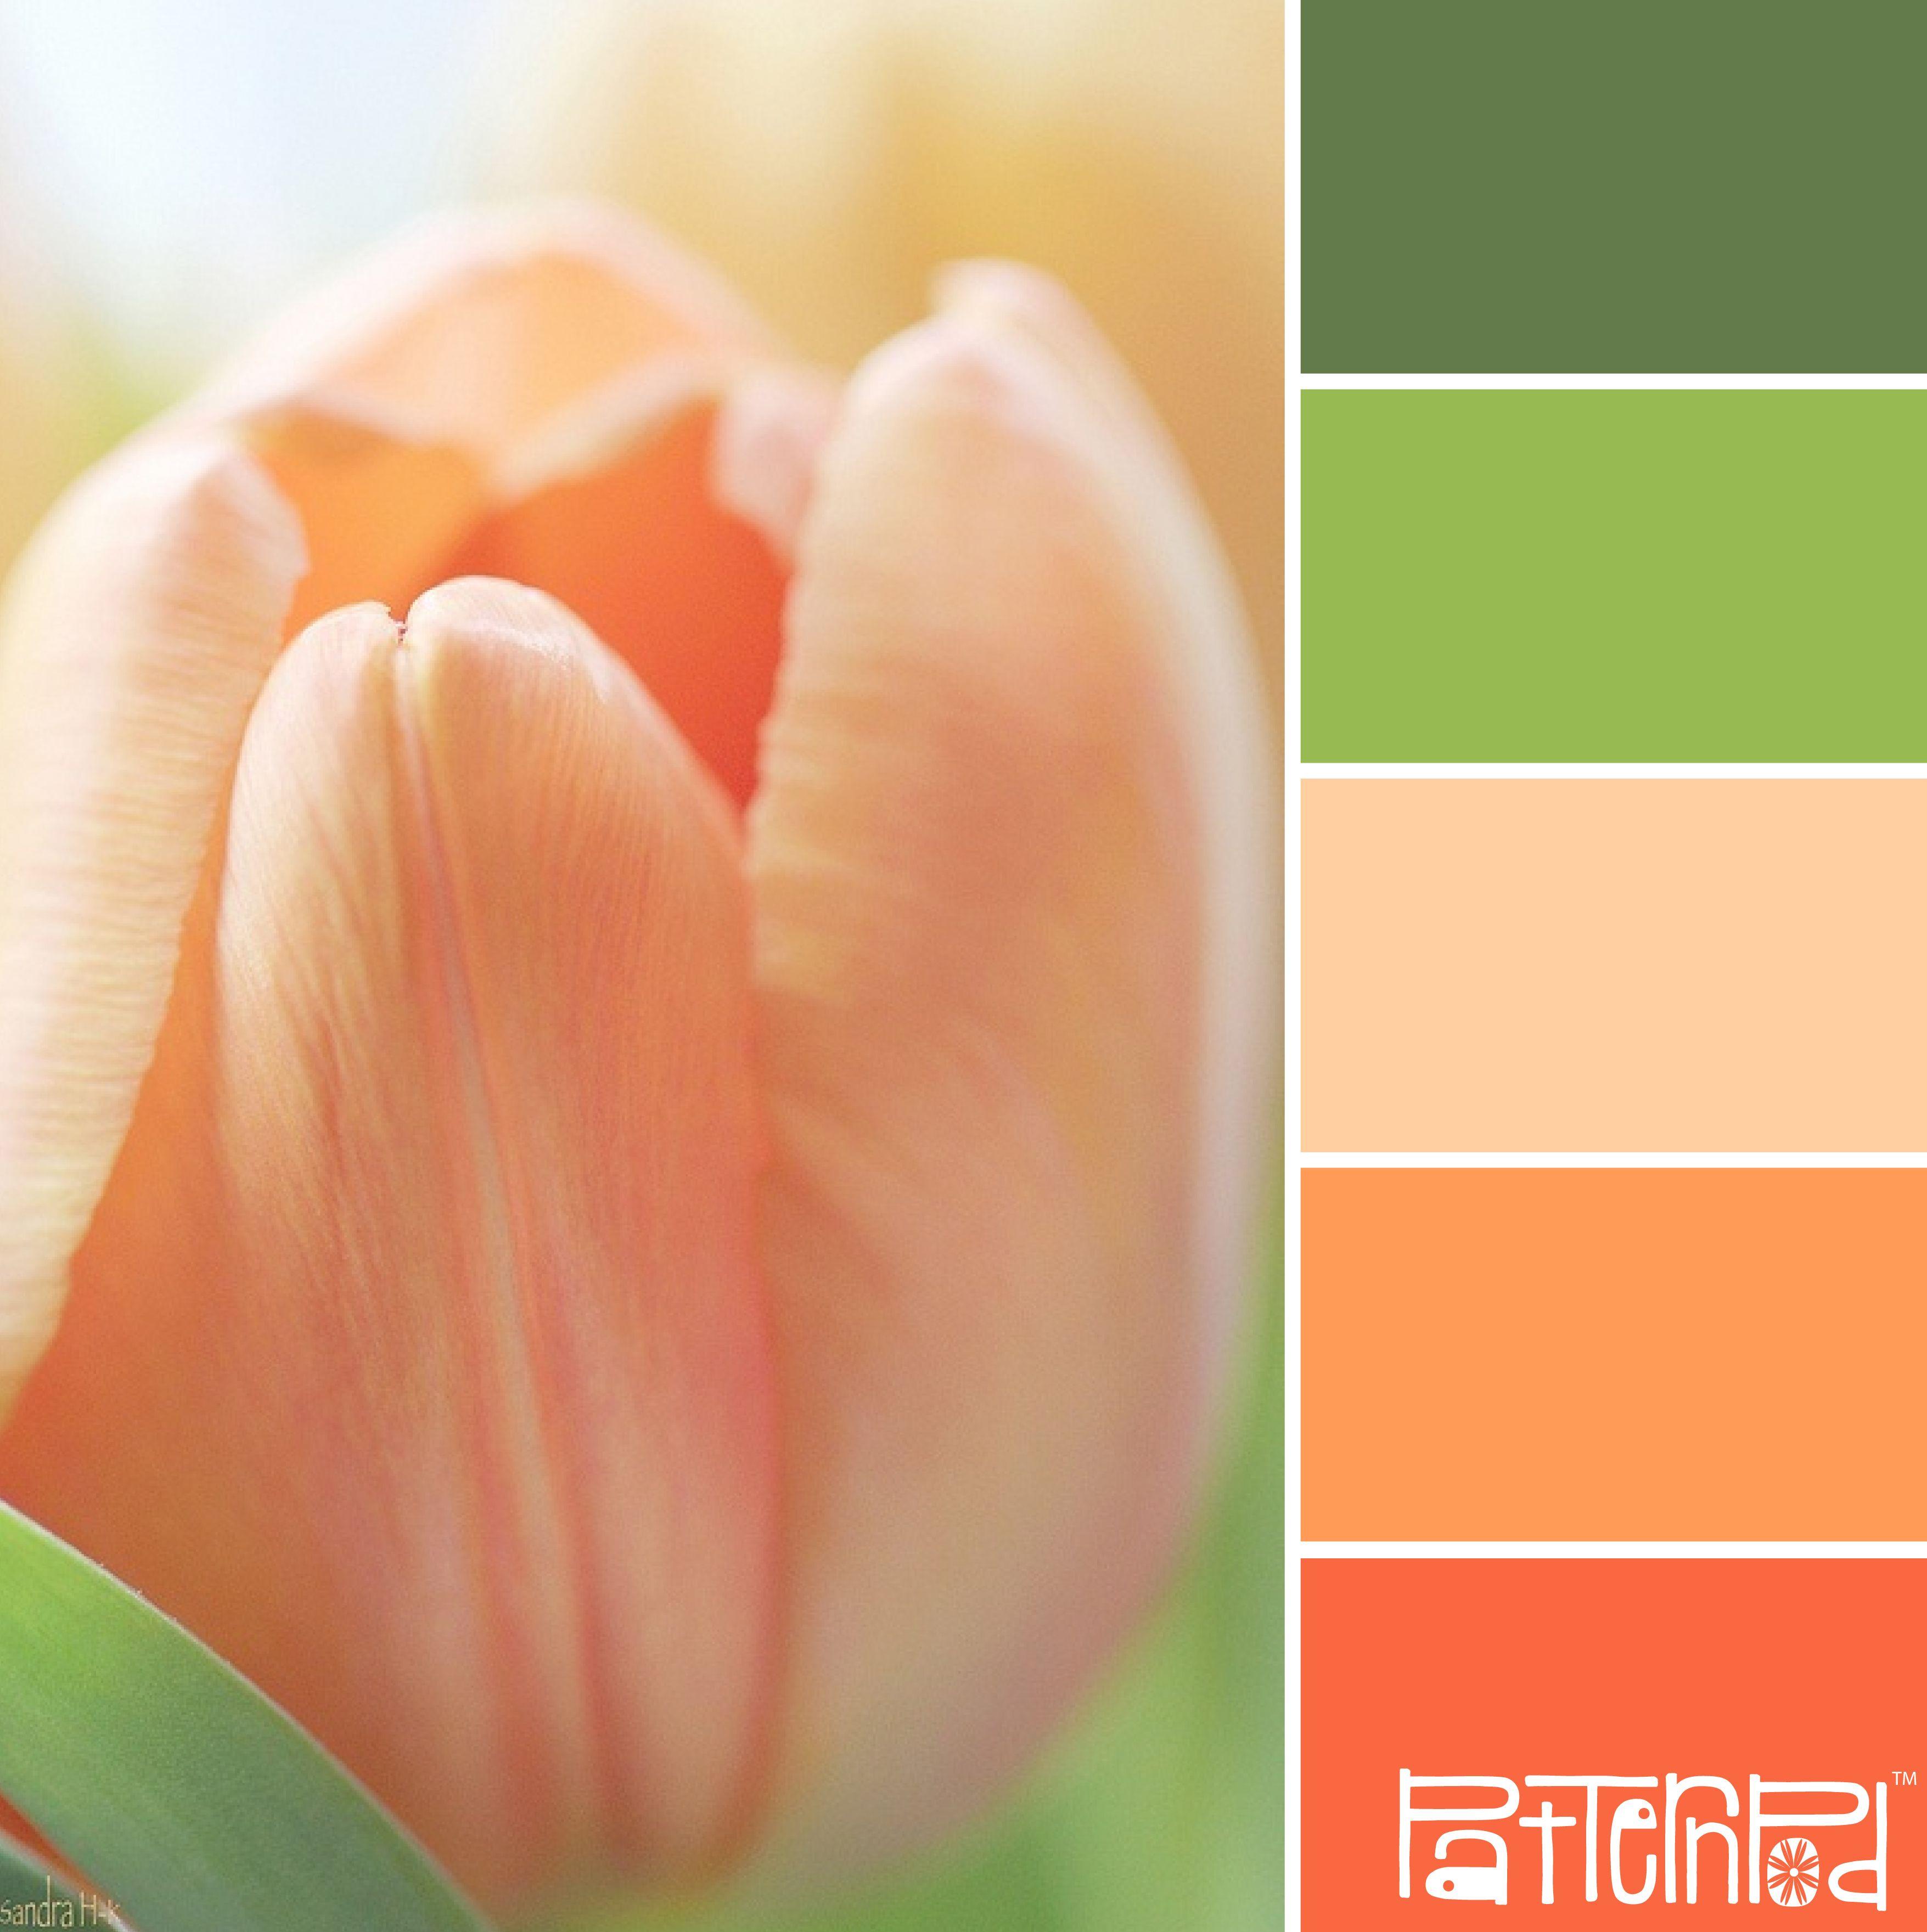 in bloom patternpod patternpodcolor color colorpalettes farbwahl pinterest. Black Bedroom Furniture Sets. Home Design Ideas